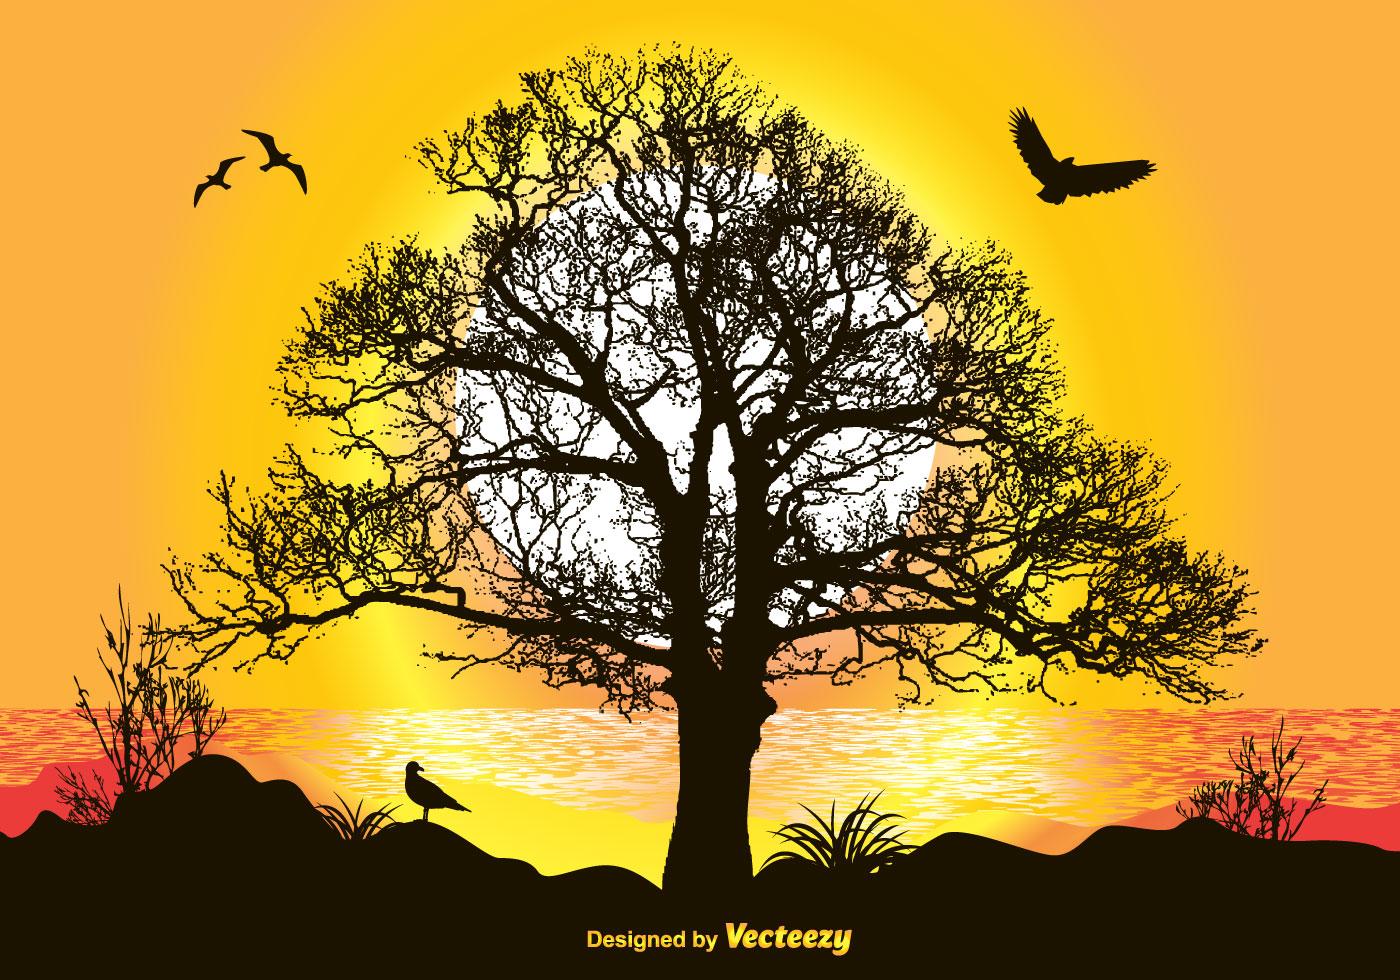 Landscape Illustration Vector Free: Beautiful Landscape Illustration